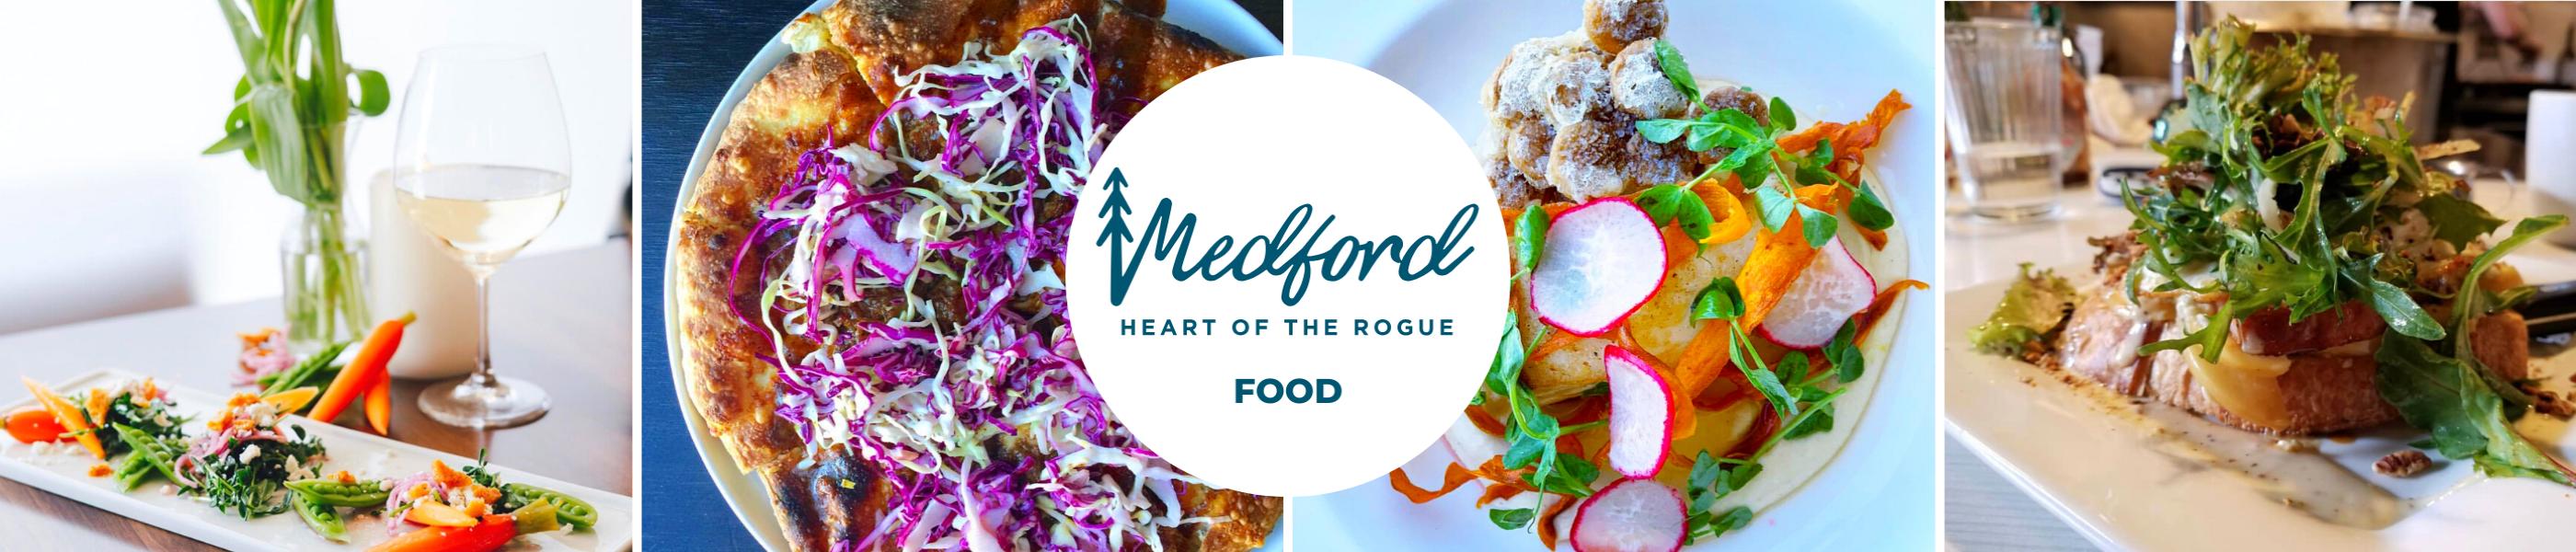 food trucks, food trucks in medford, good food in medford